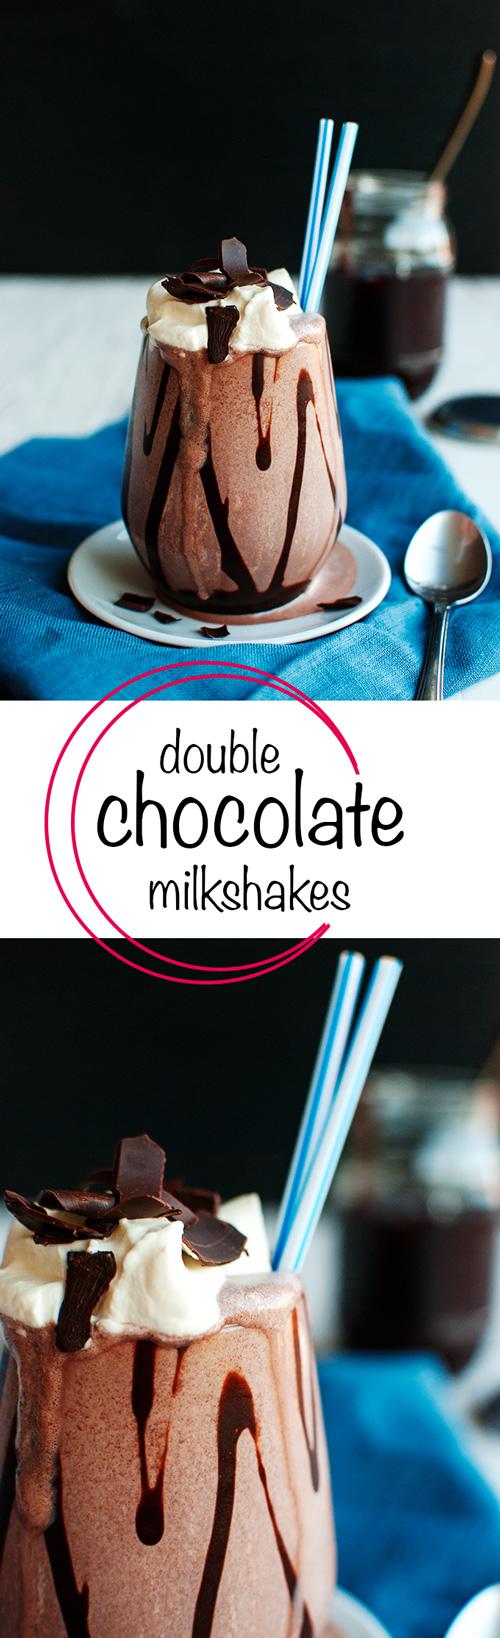 Double Chocolate Milkshakes - So good! | thetoughcookie.com